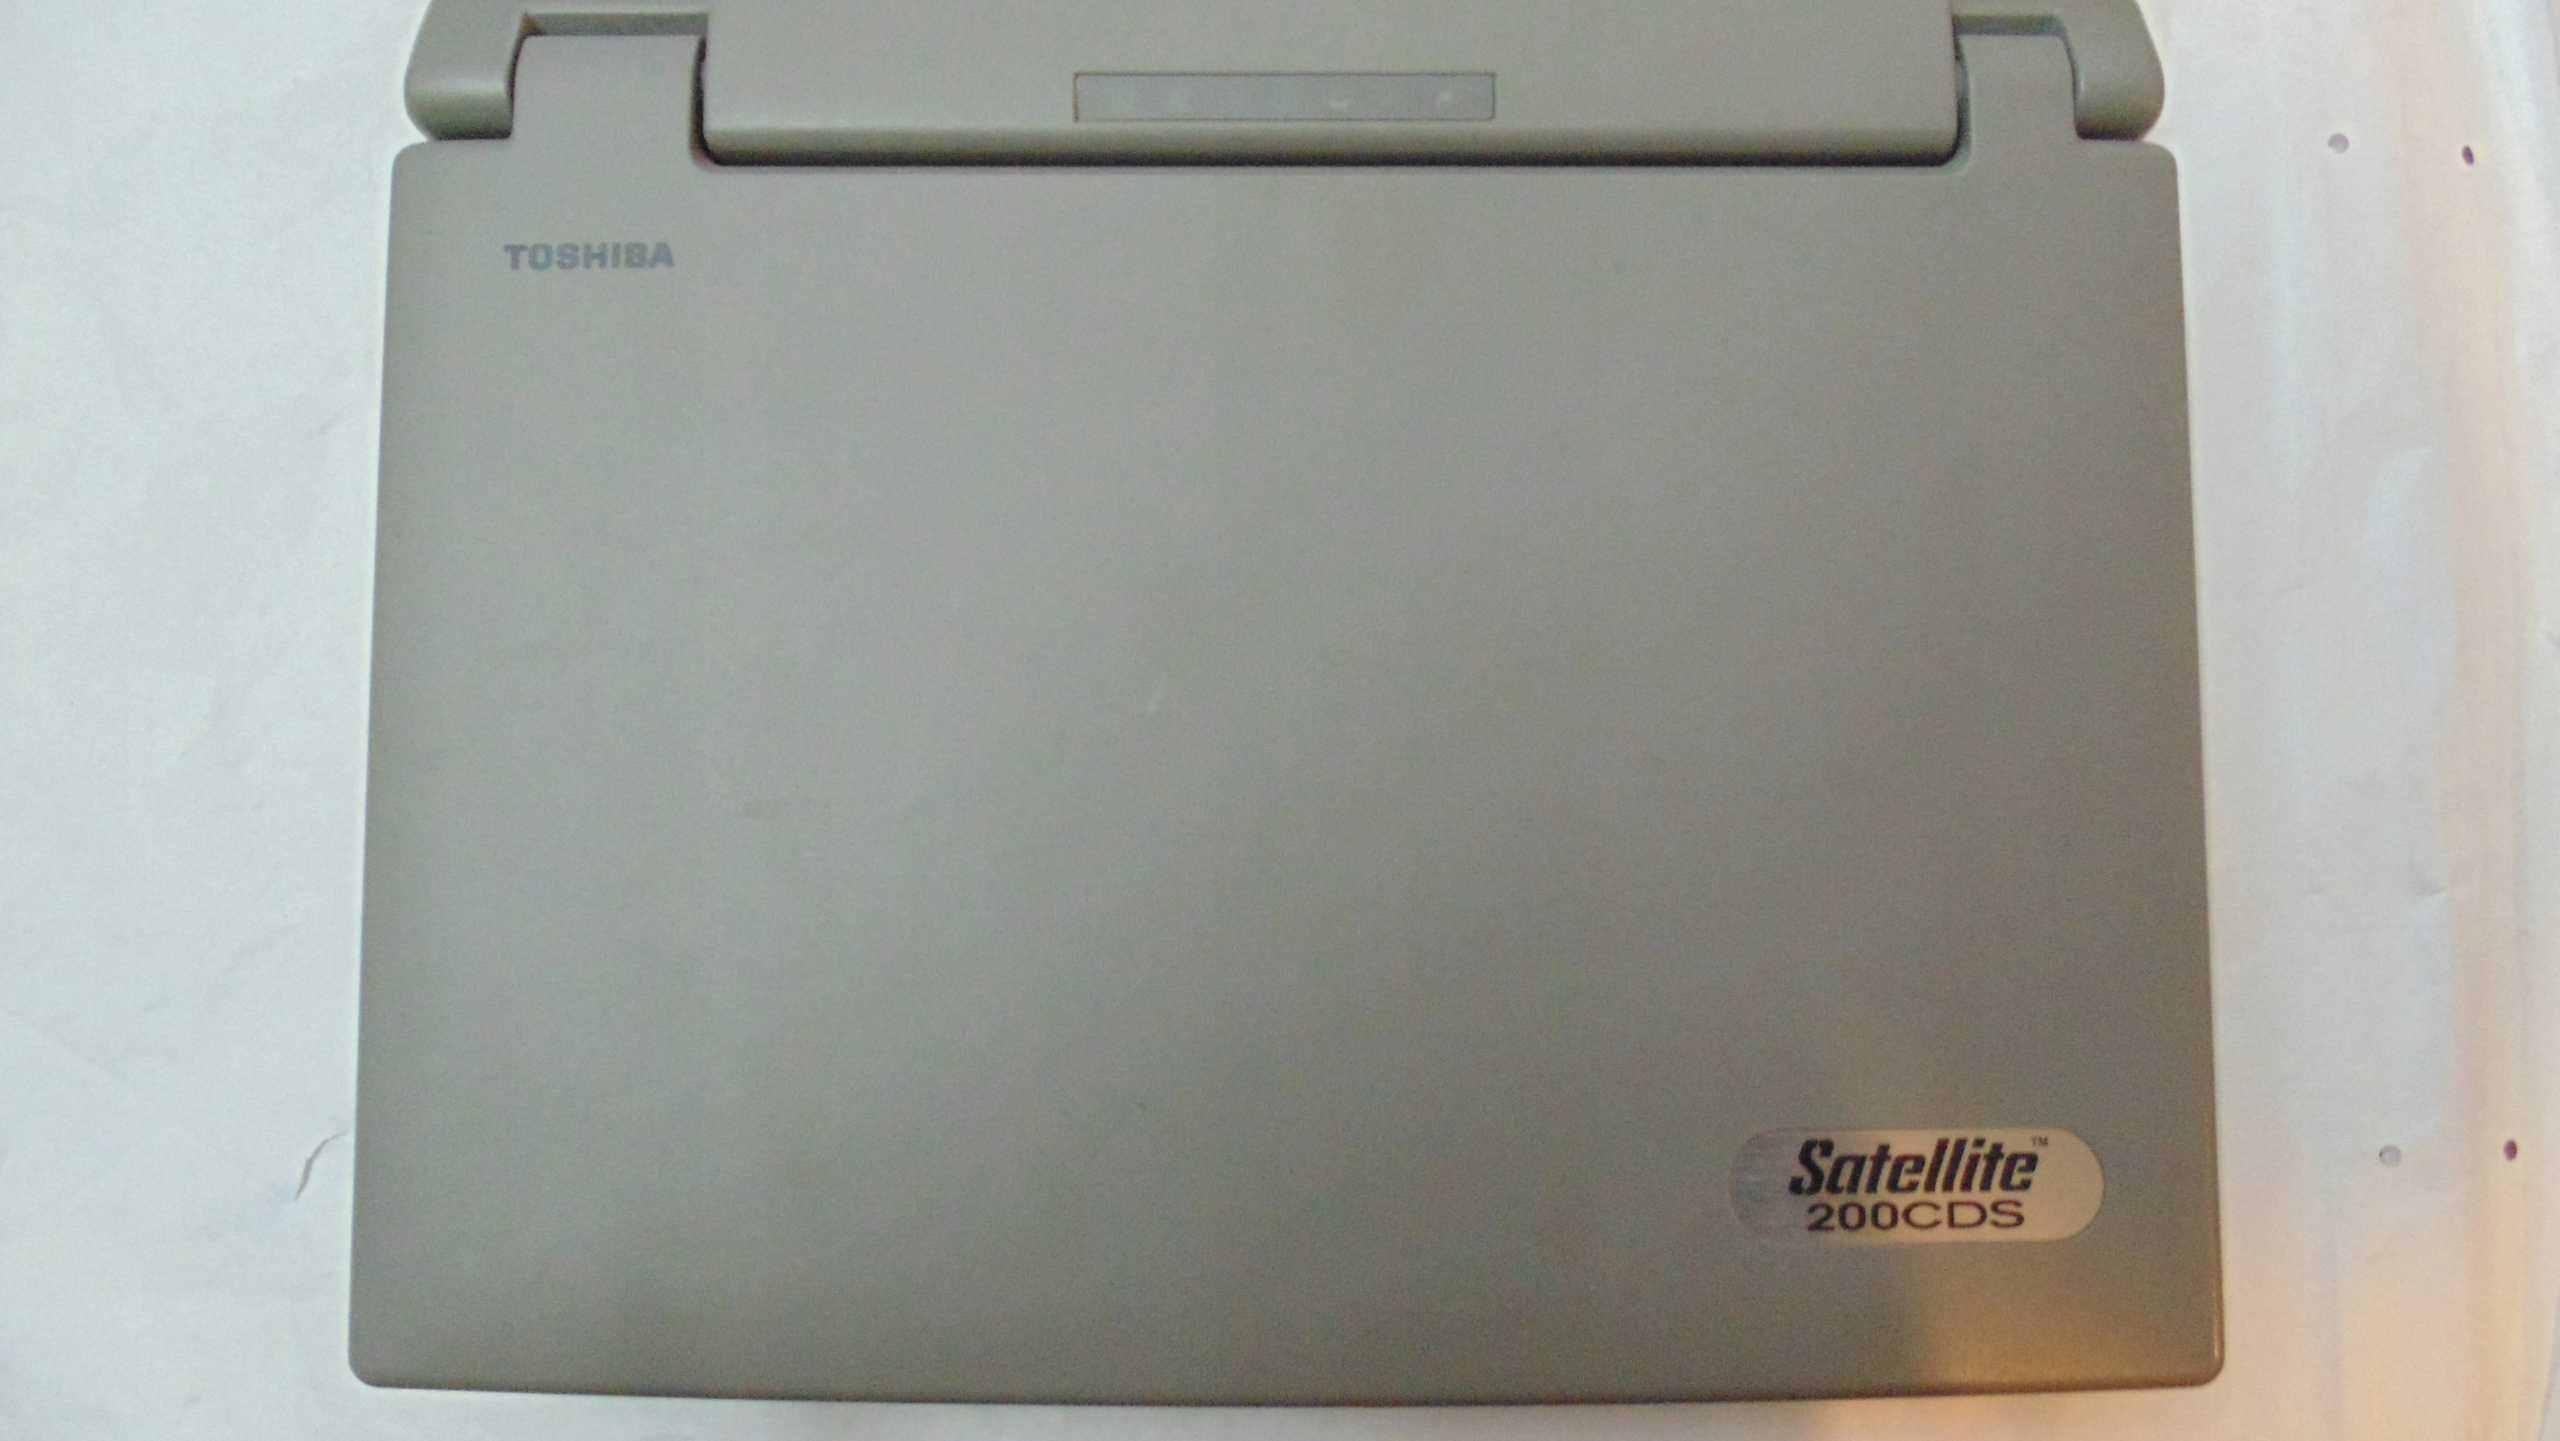 Kolekcjonerski laptop Toshiba Satellite 200CDS